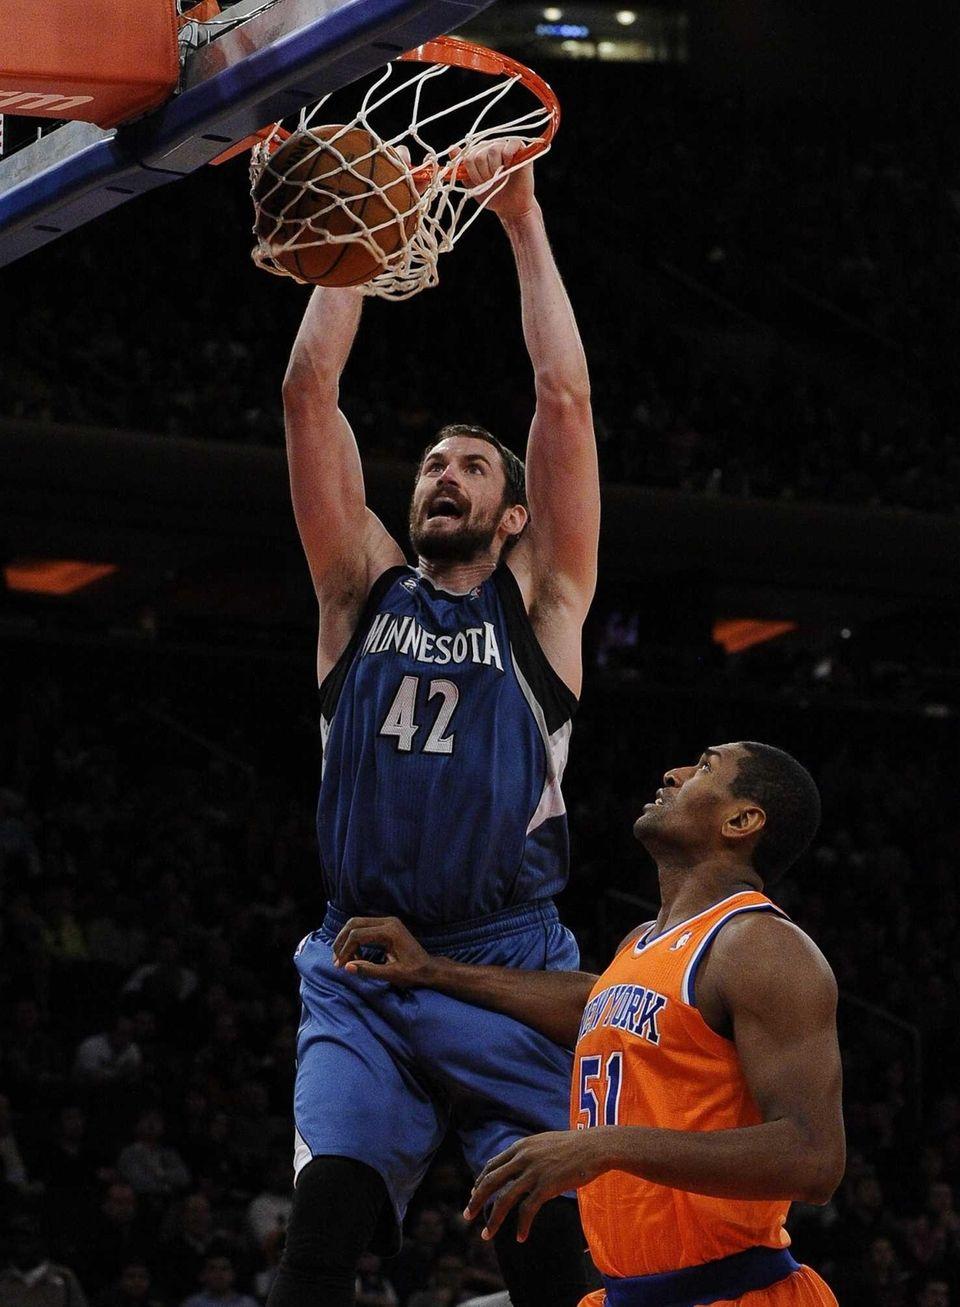 Minnesota Timberwolves forward Kevin Love dunks over Knicks